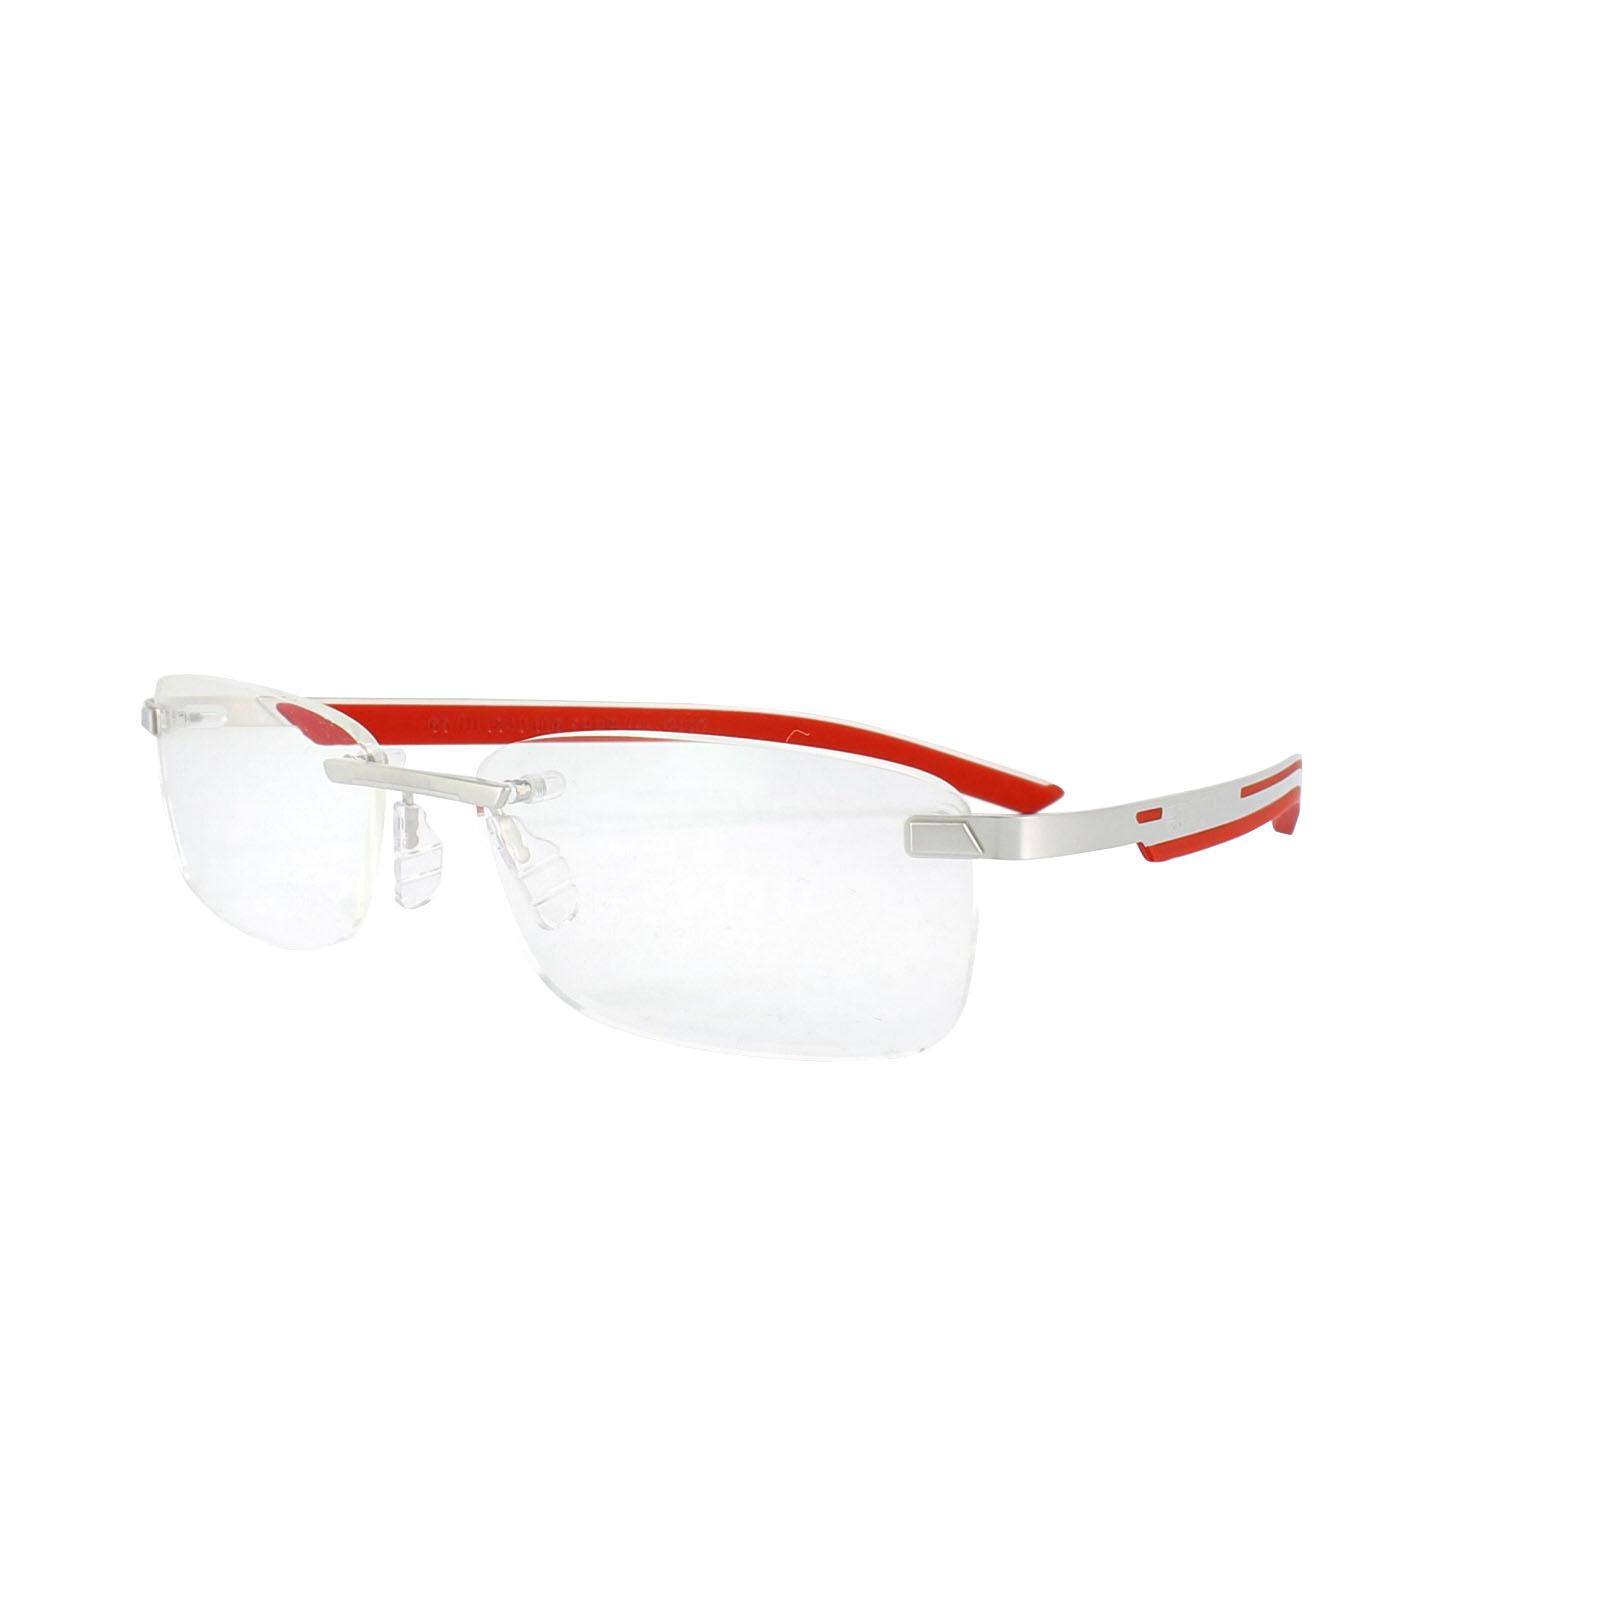 Tag heuer eyeglasses frames uk - Tag Heuer Eyeglasses Frames Uk 13